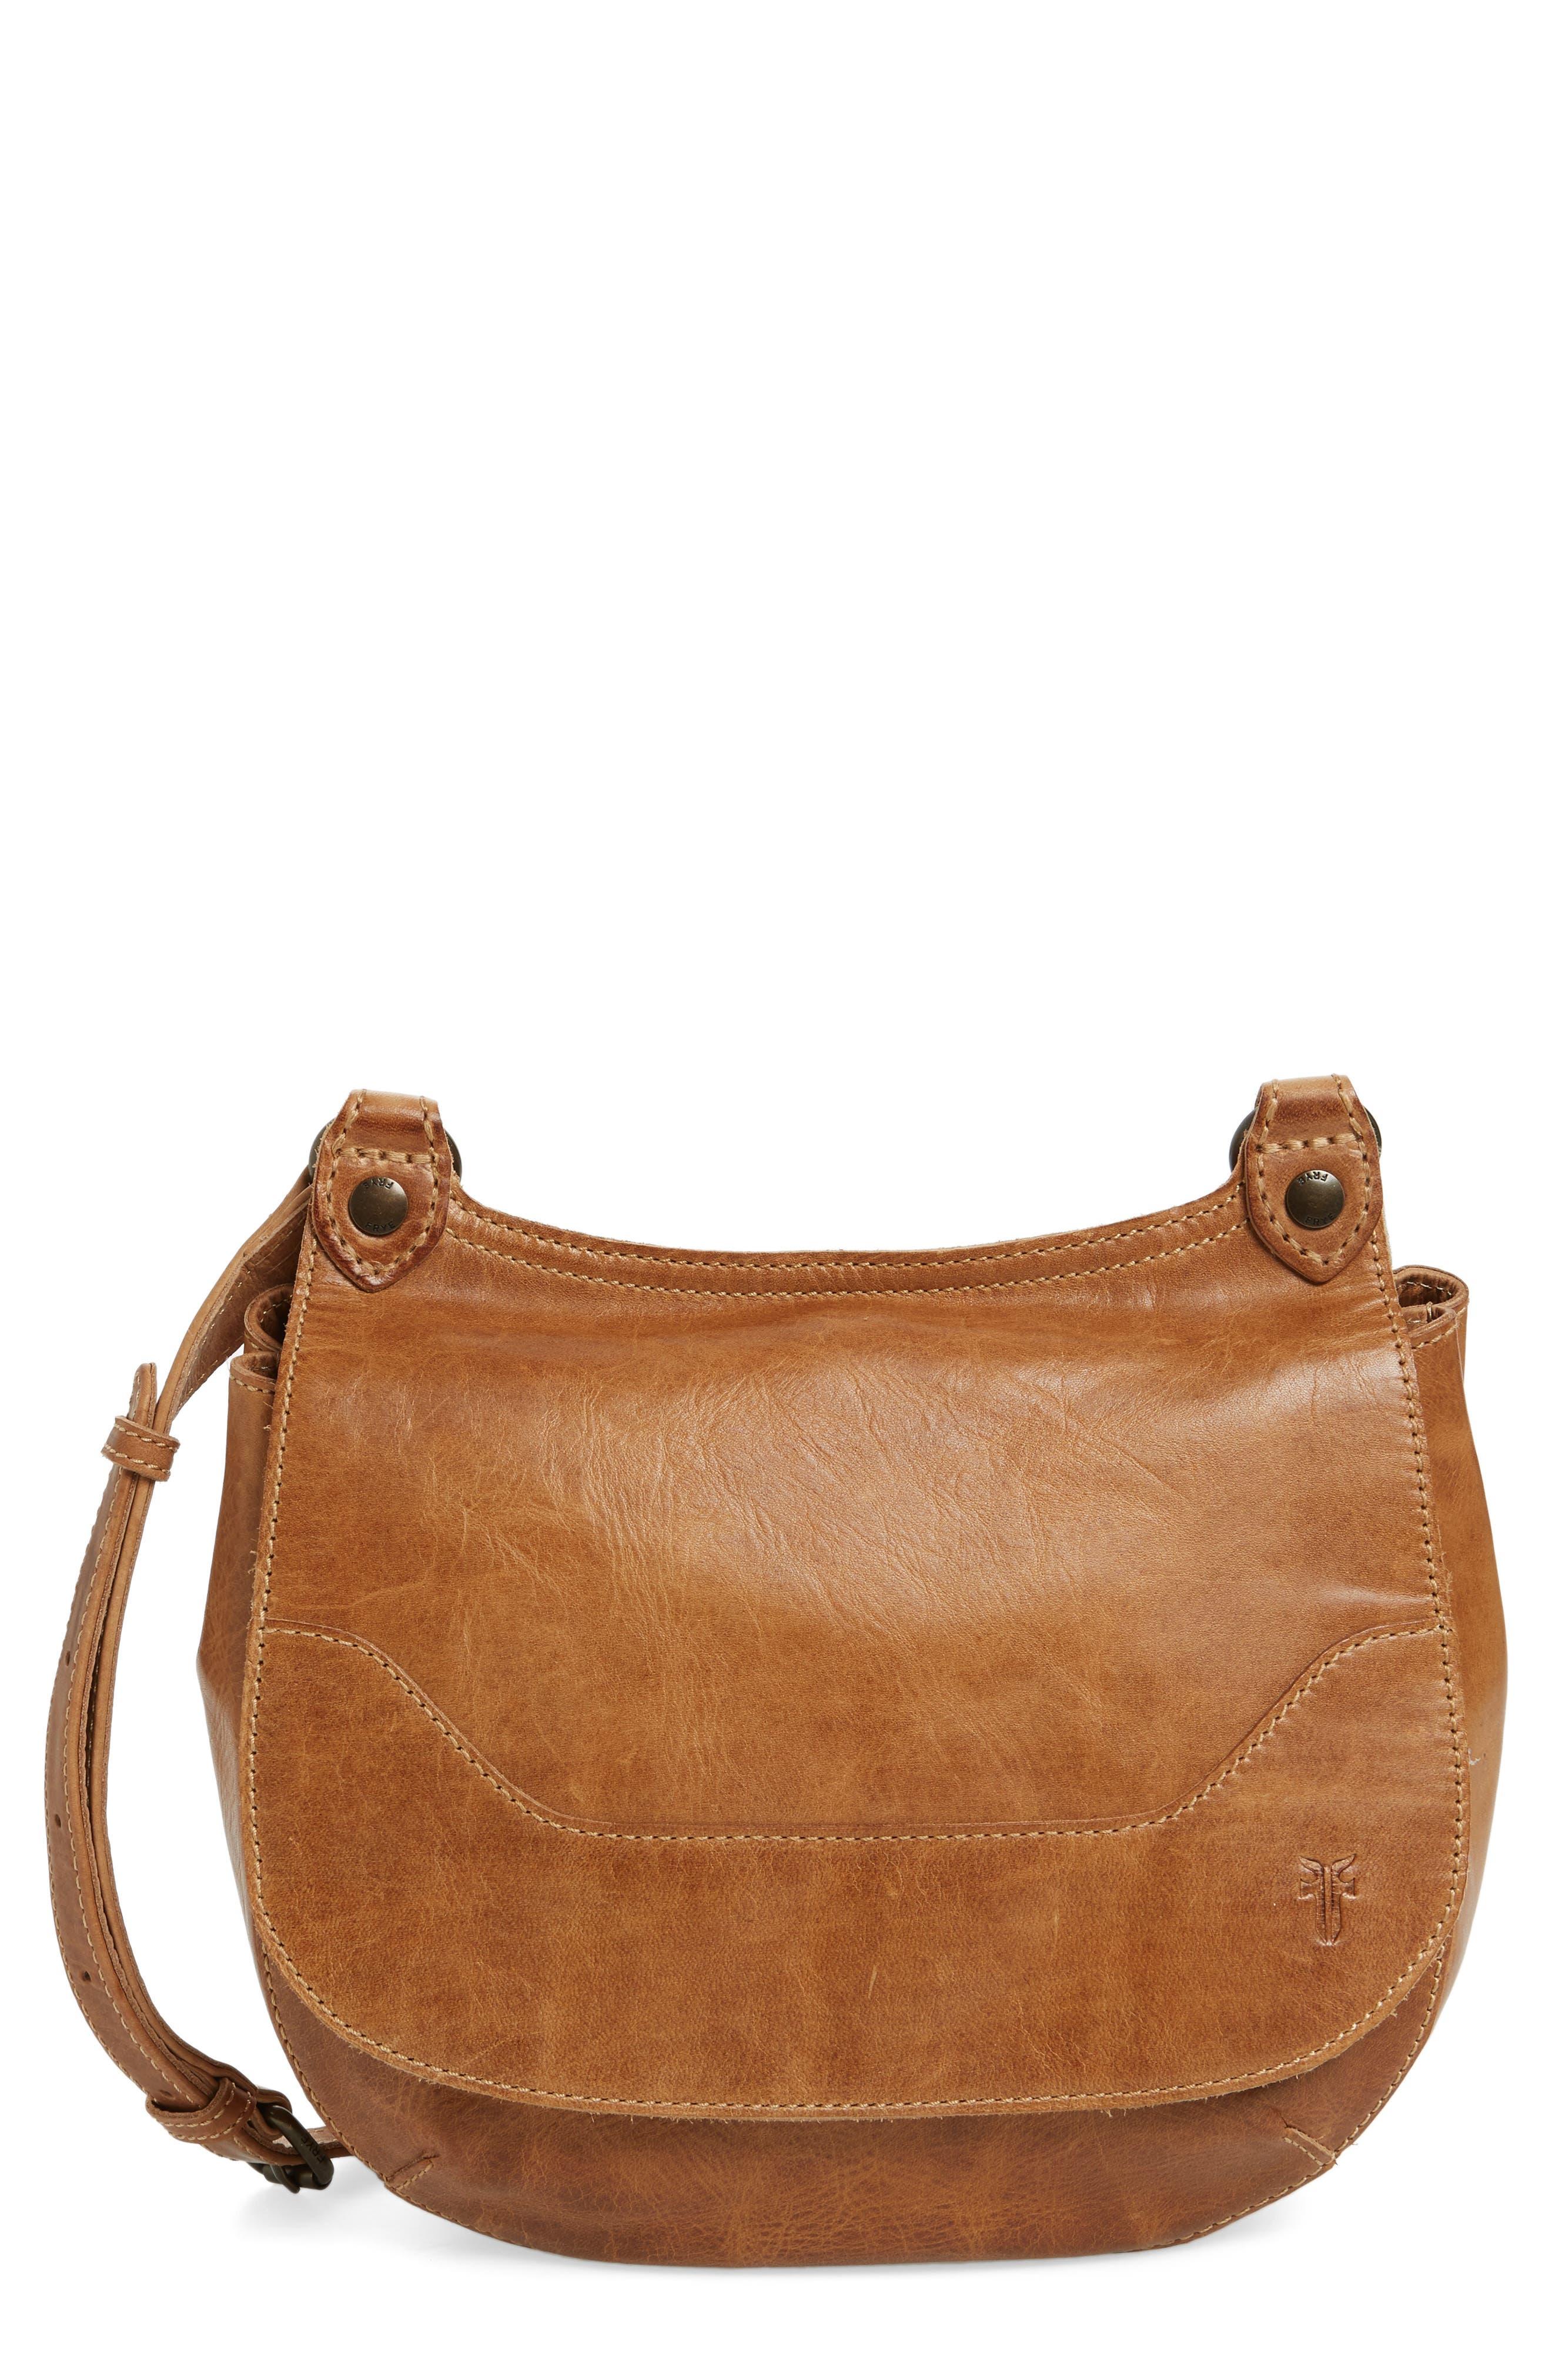 Main Image - Frye 'Melissa' Leather Crossbody Bag